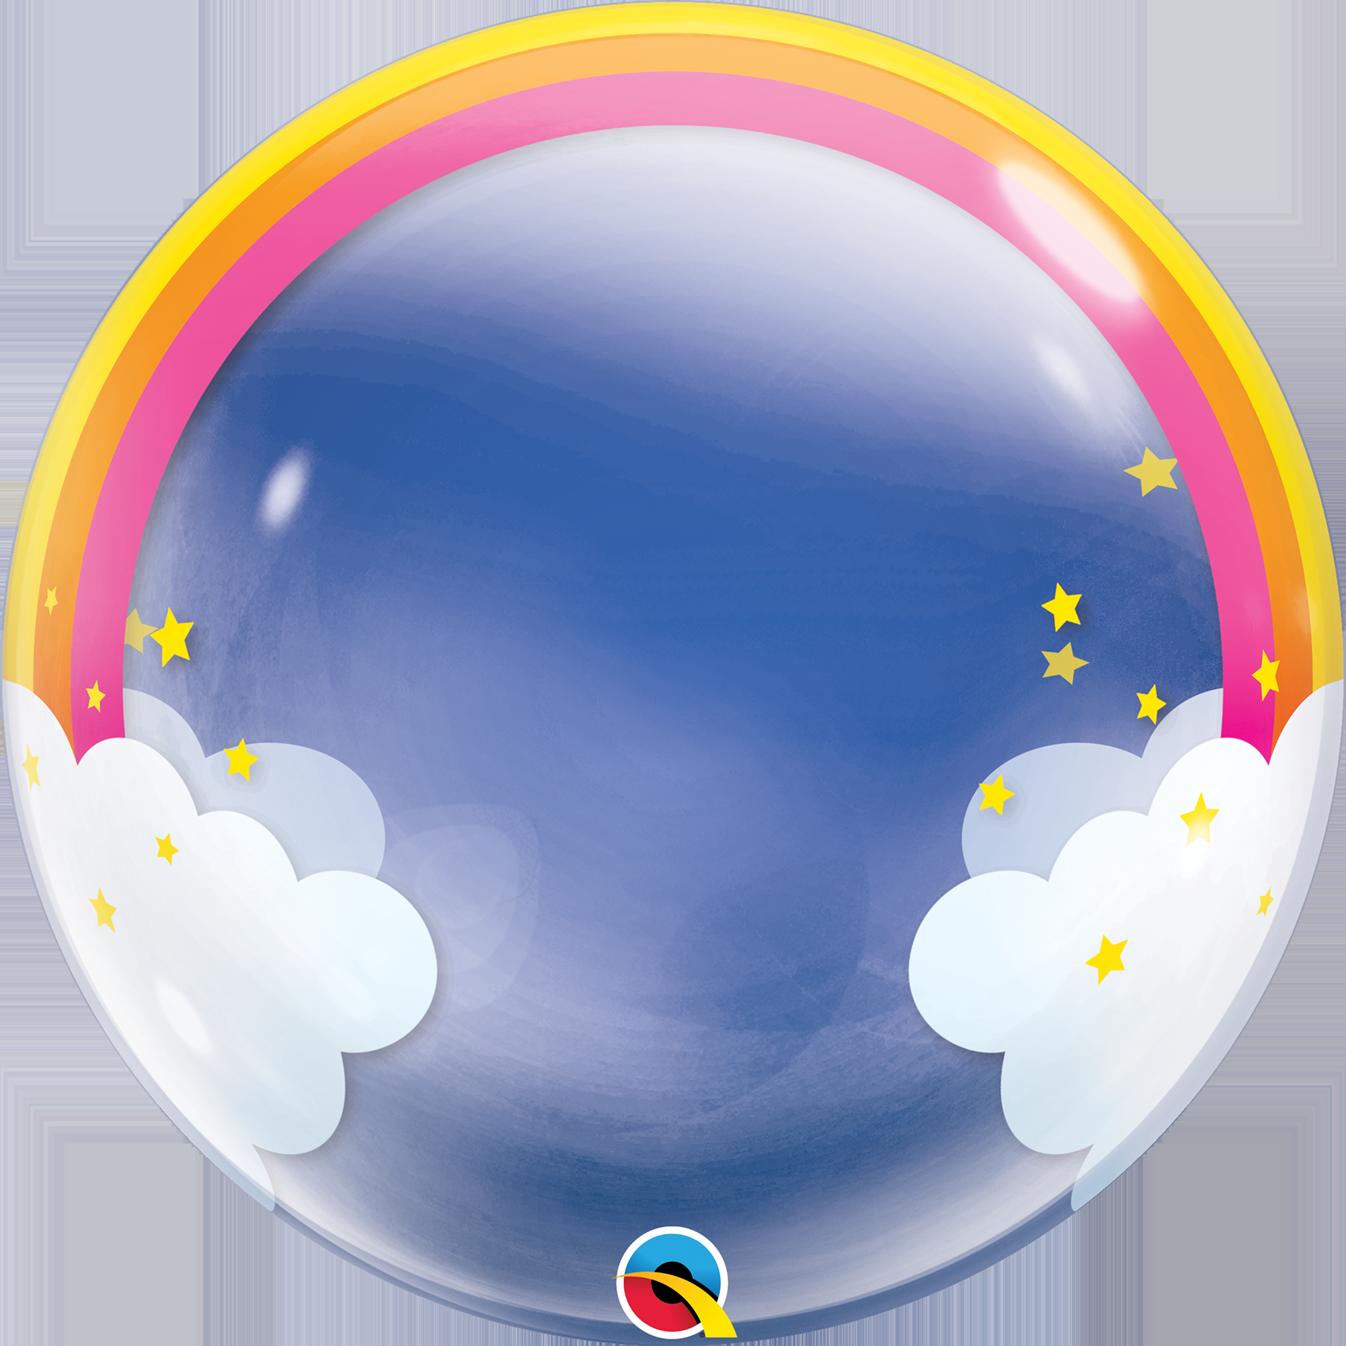 Decobubble Rainbow Clouds - 64848